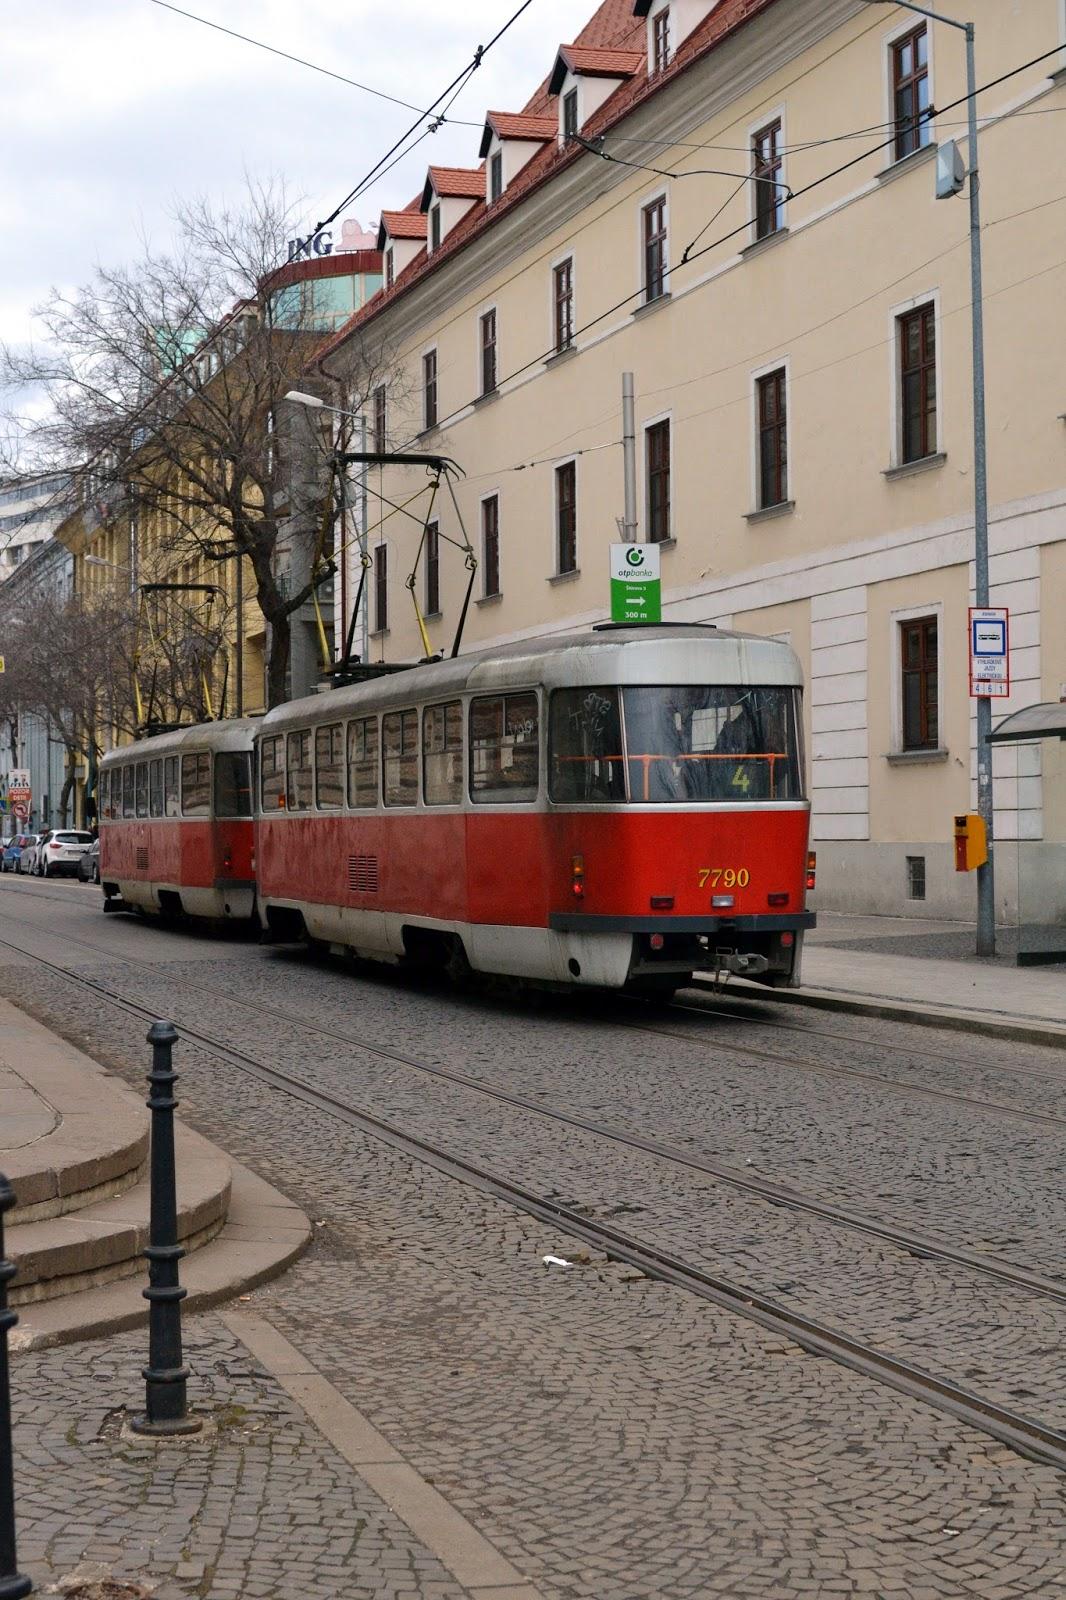 Slovakia, Bratislava, off the beaten track, eastern europe, eu, historical city, on the danube, ufo, bridge, communist. tram